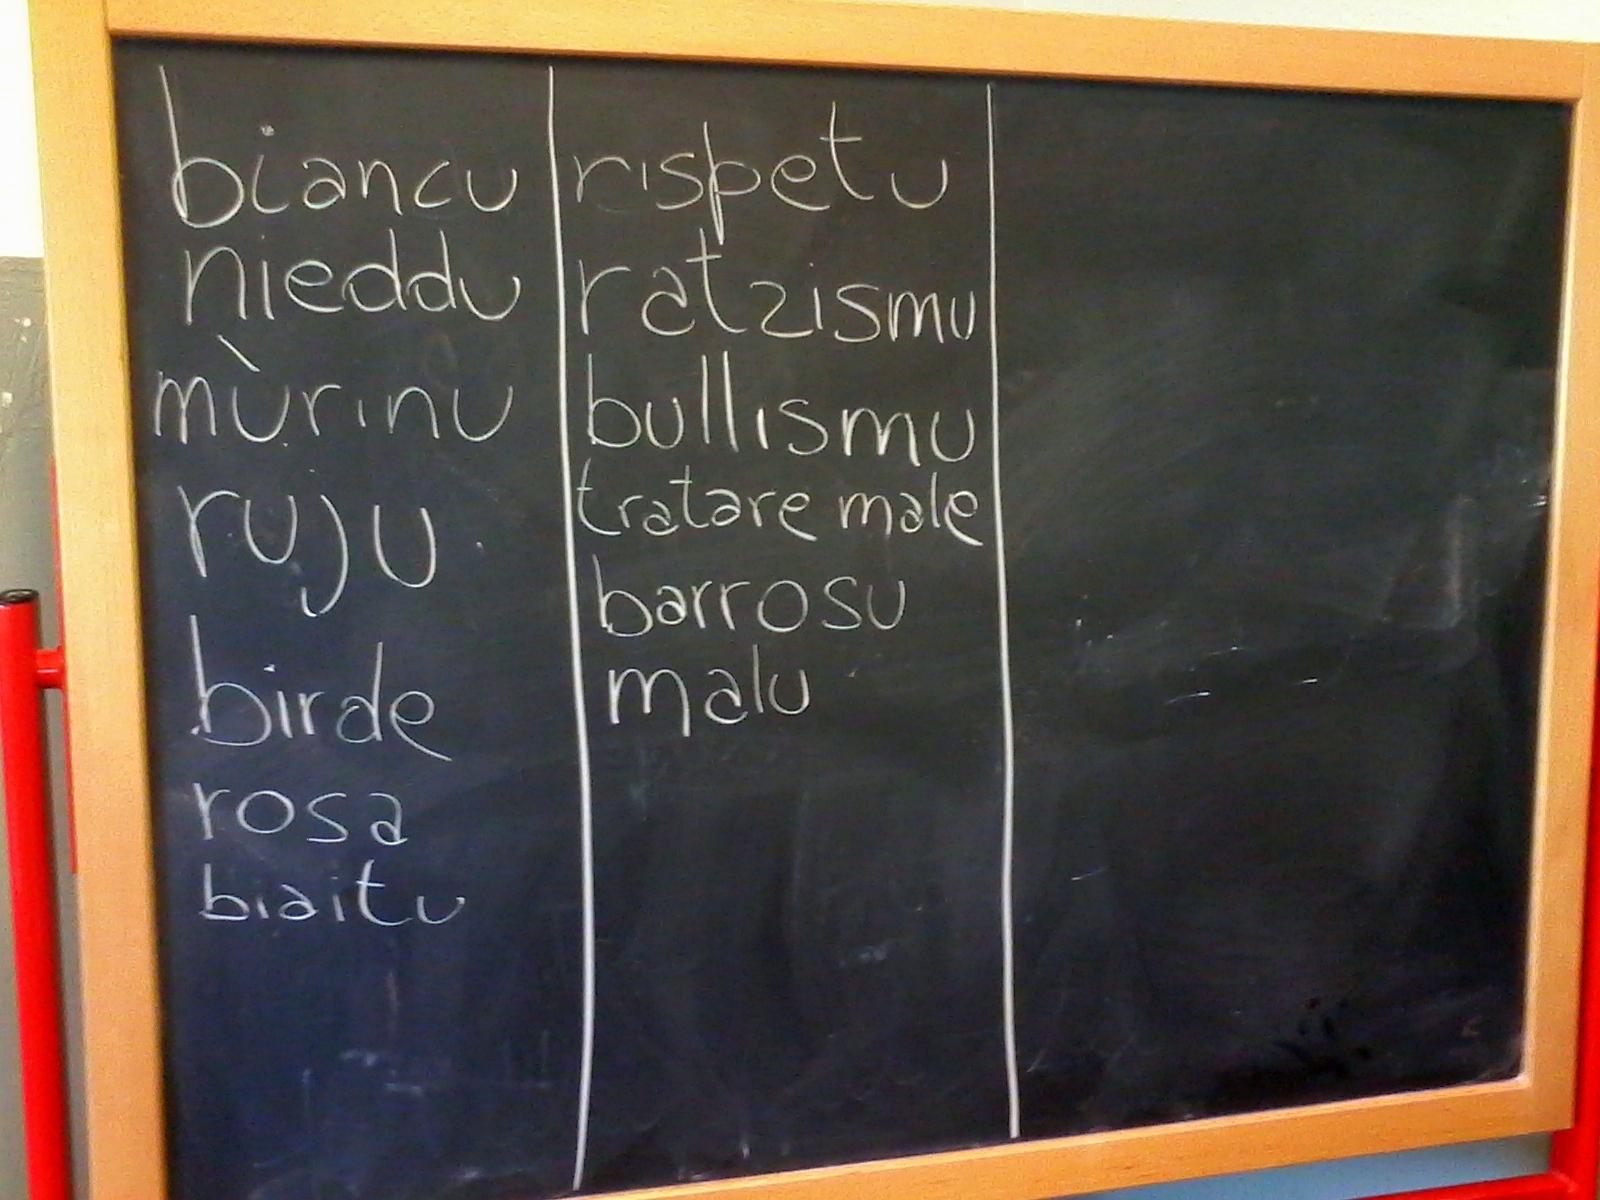 Ratzismu